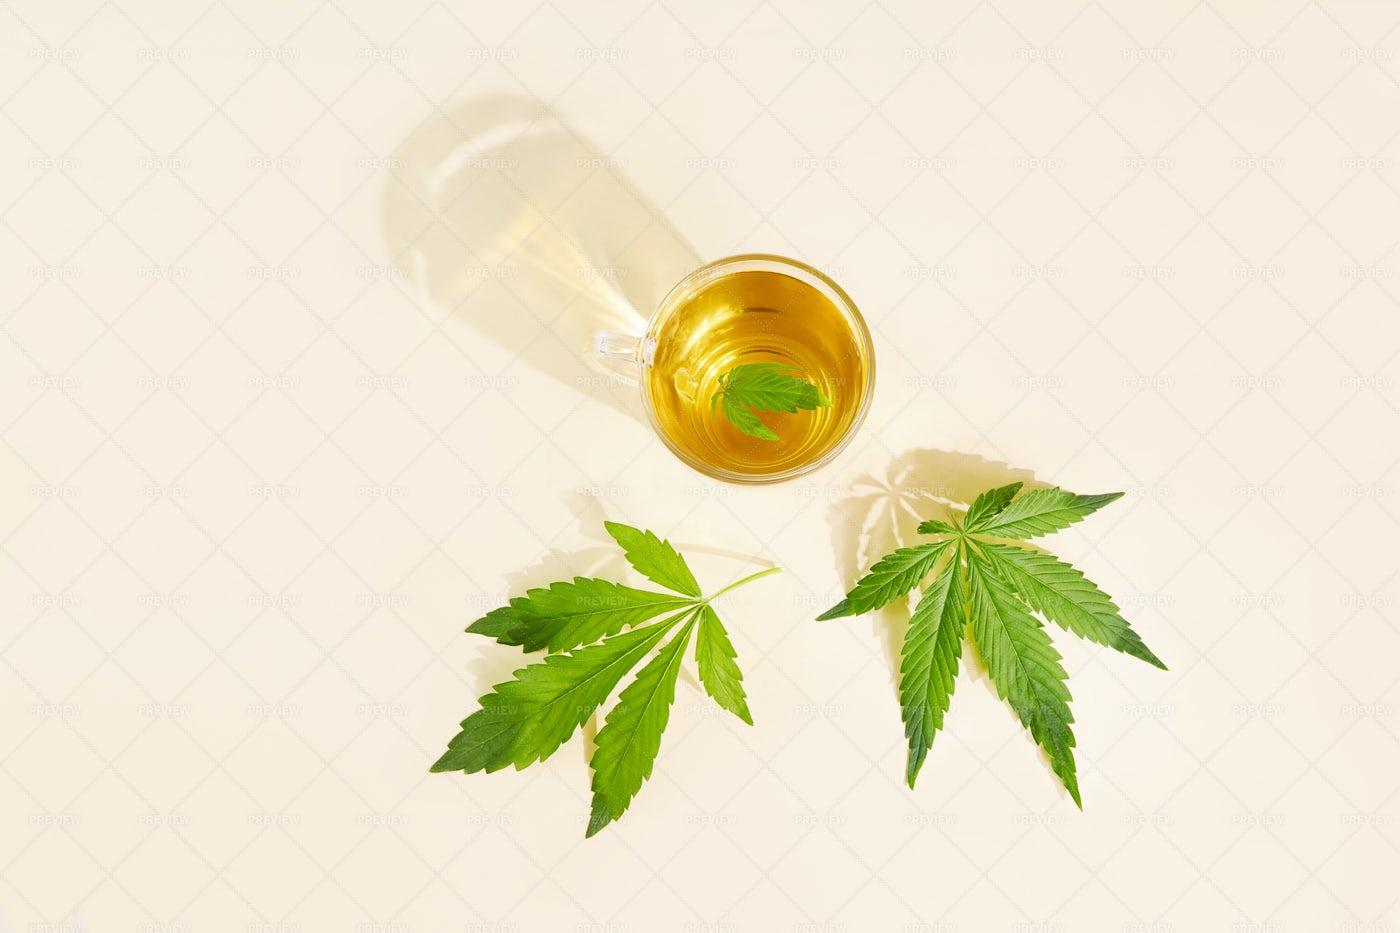 Cup Of Cannabis Tea: Stock Photos